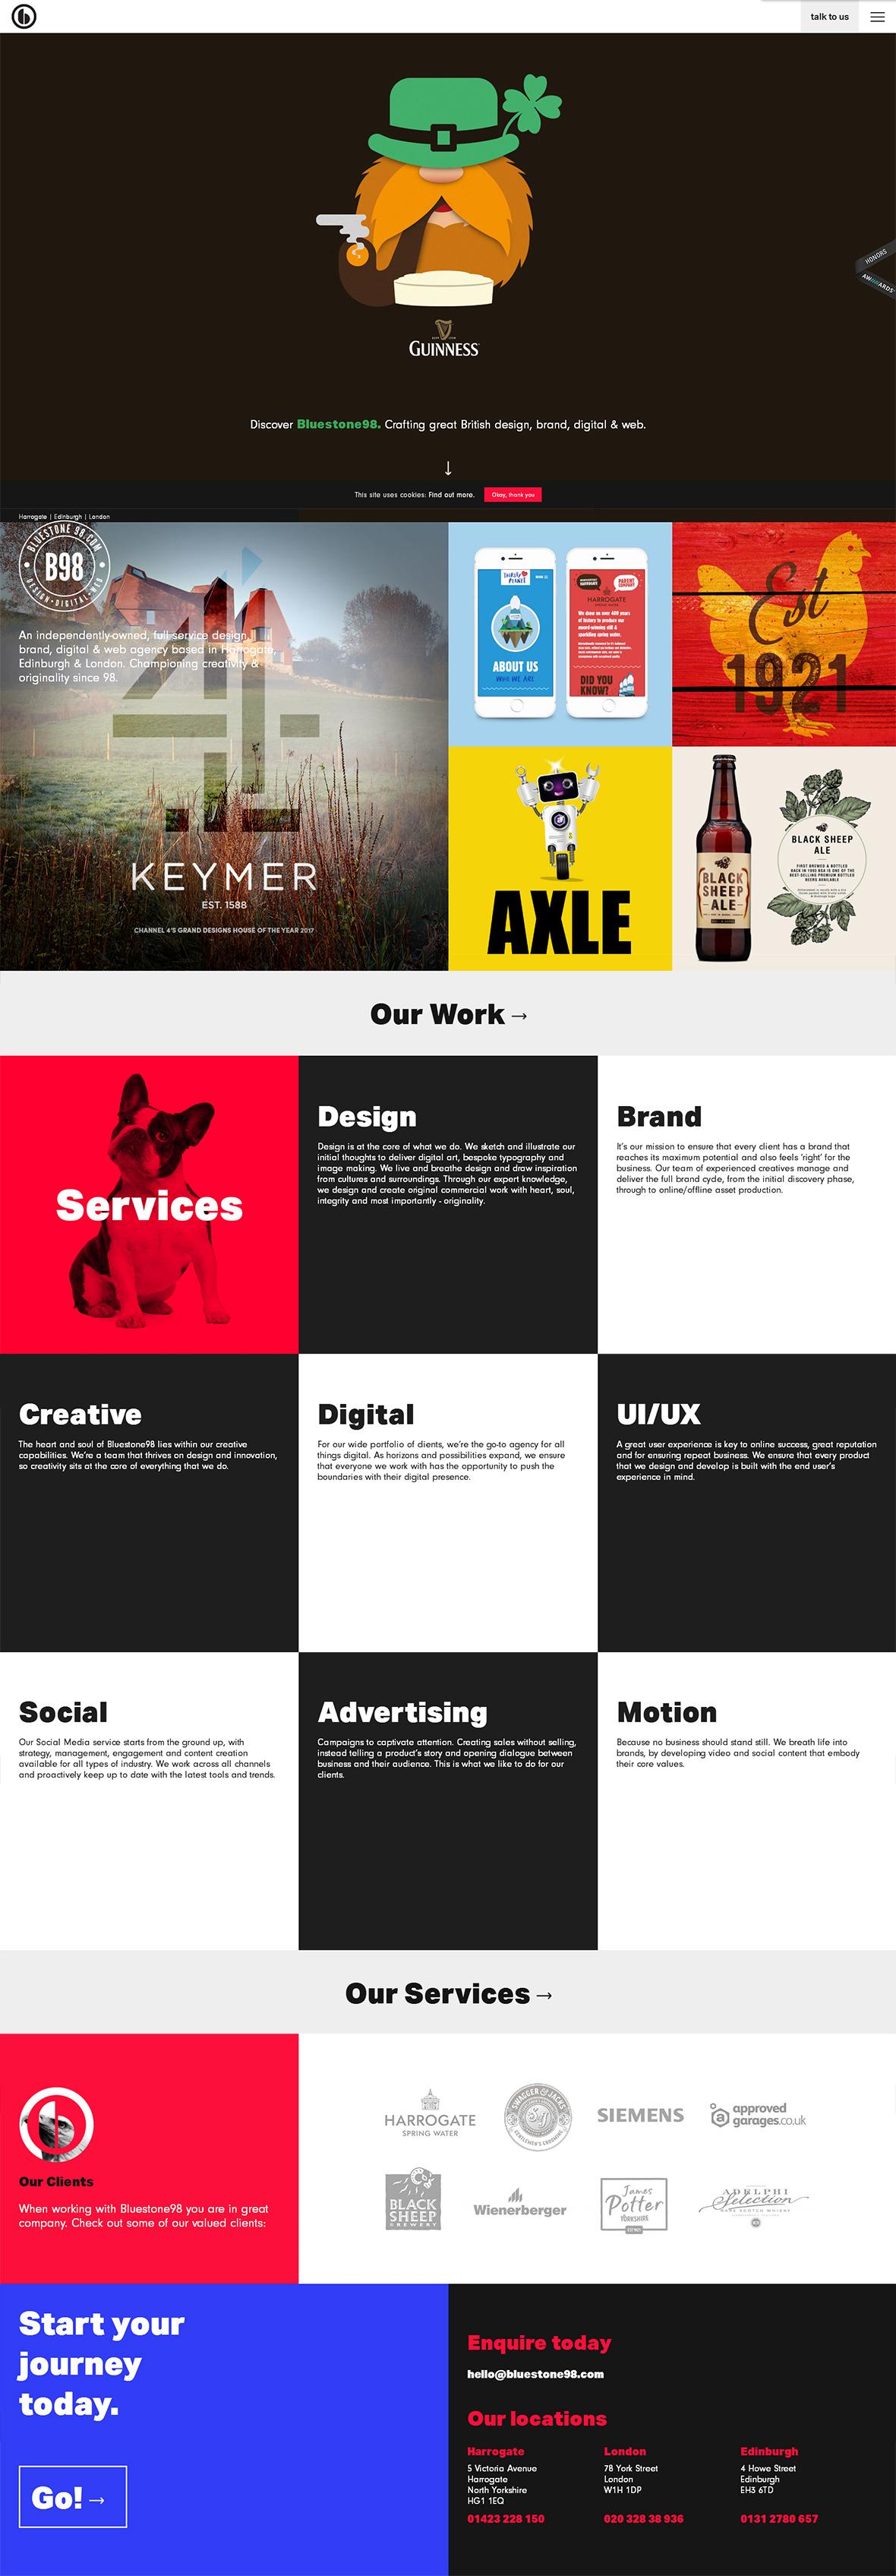 bluestone98-创意,网页设计,创意设计,创意网站,字体设计,设计网站,设计作品,网站欣赏,优,ui设计,设计,设计师,平面设计,电商设计,动漫设计,网站设计